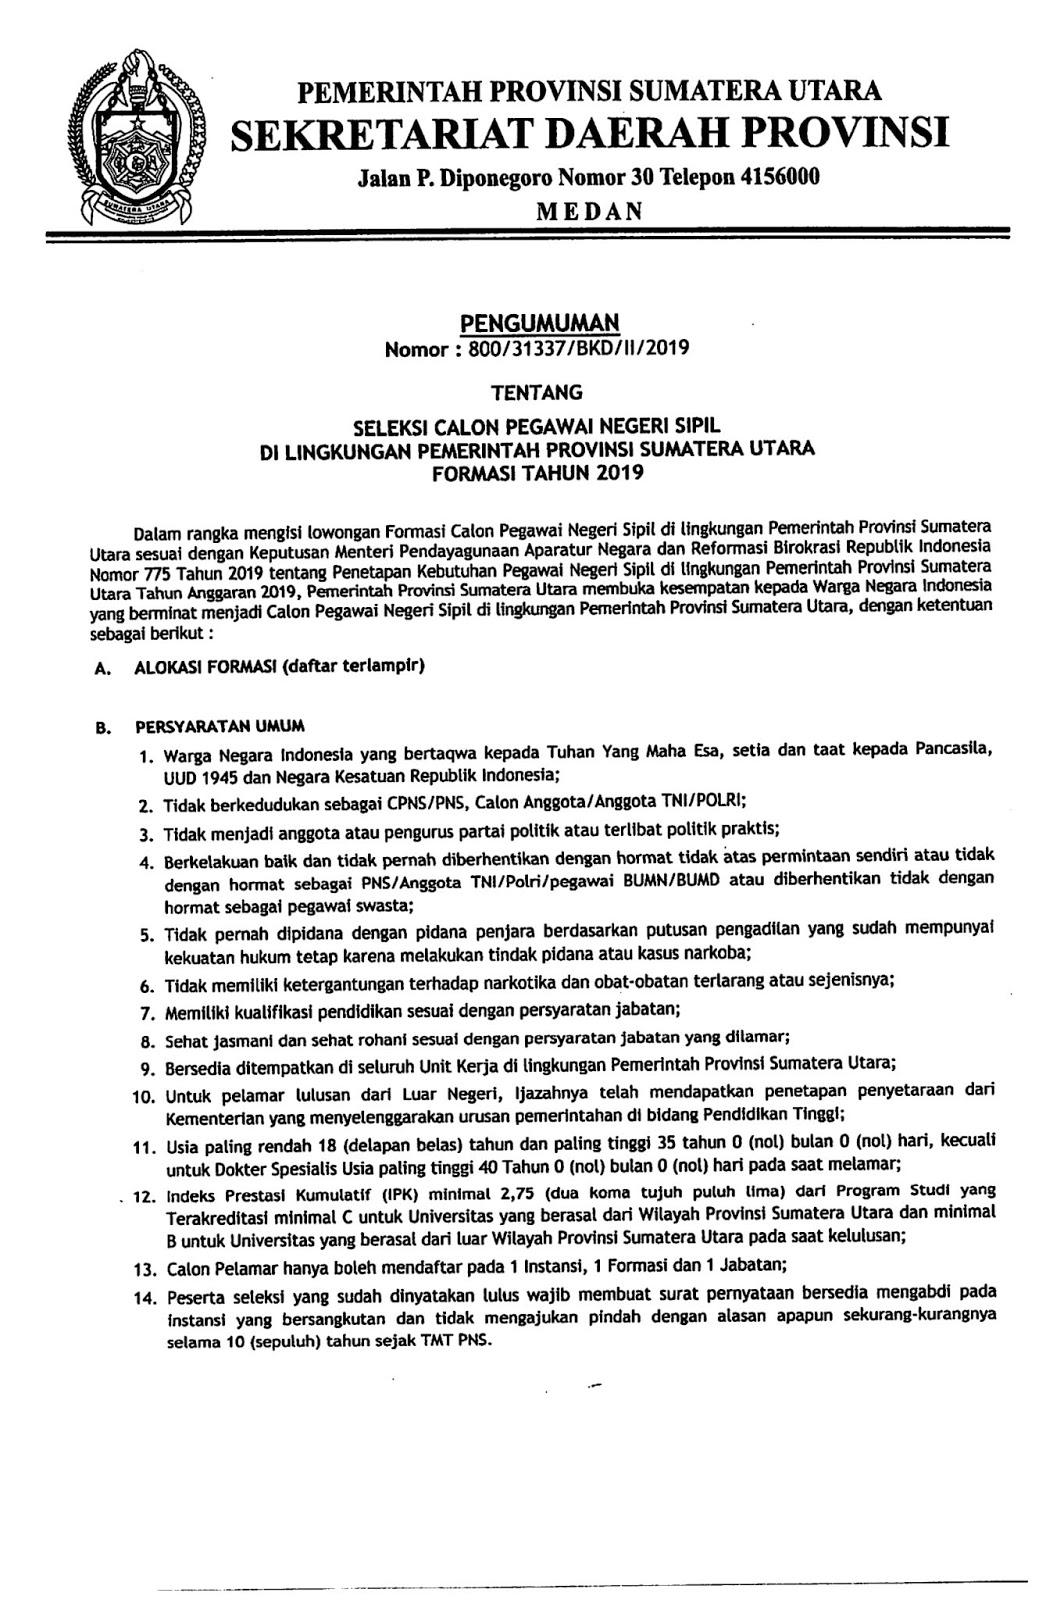 Lowongan CPNS Pemprov Sumatera Utara Tahun 2019 [306 Formasi]